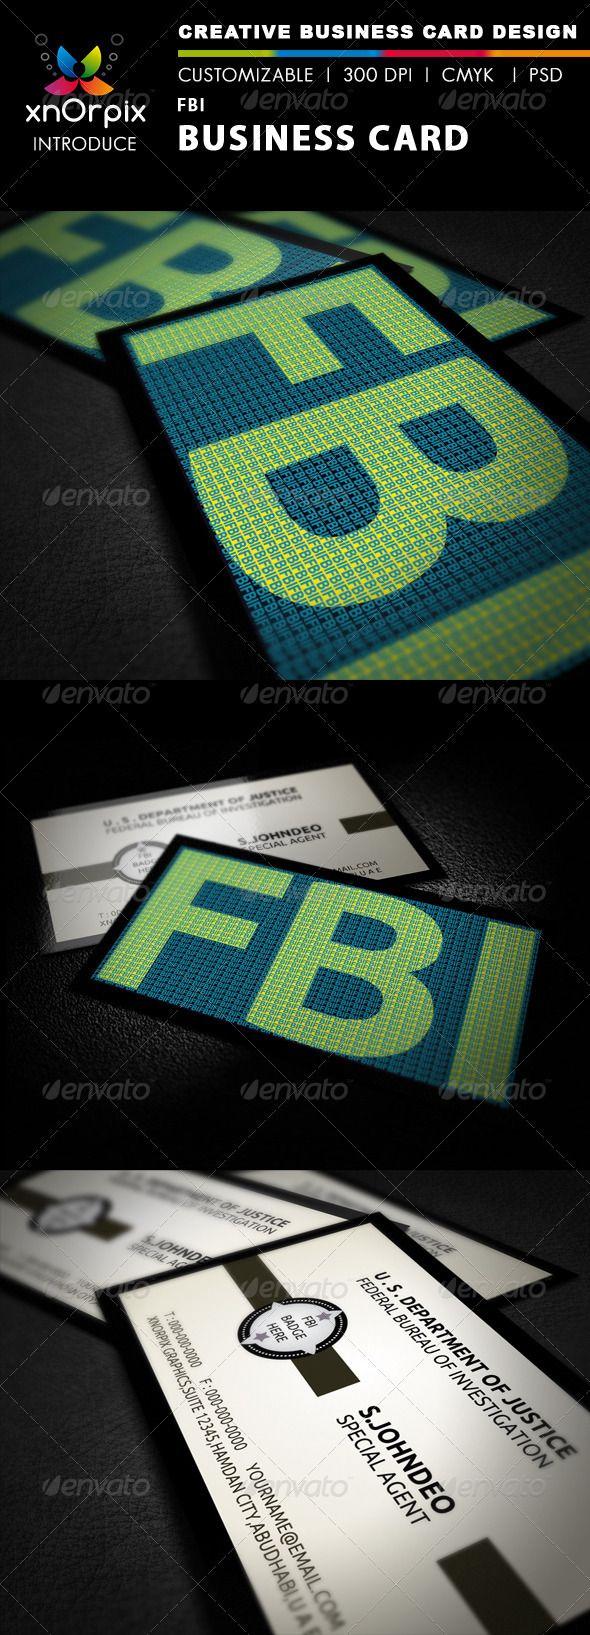 Fbi Business Card Business Card Branding Corporate Business Card Print Templates